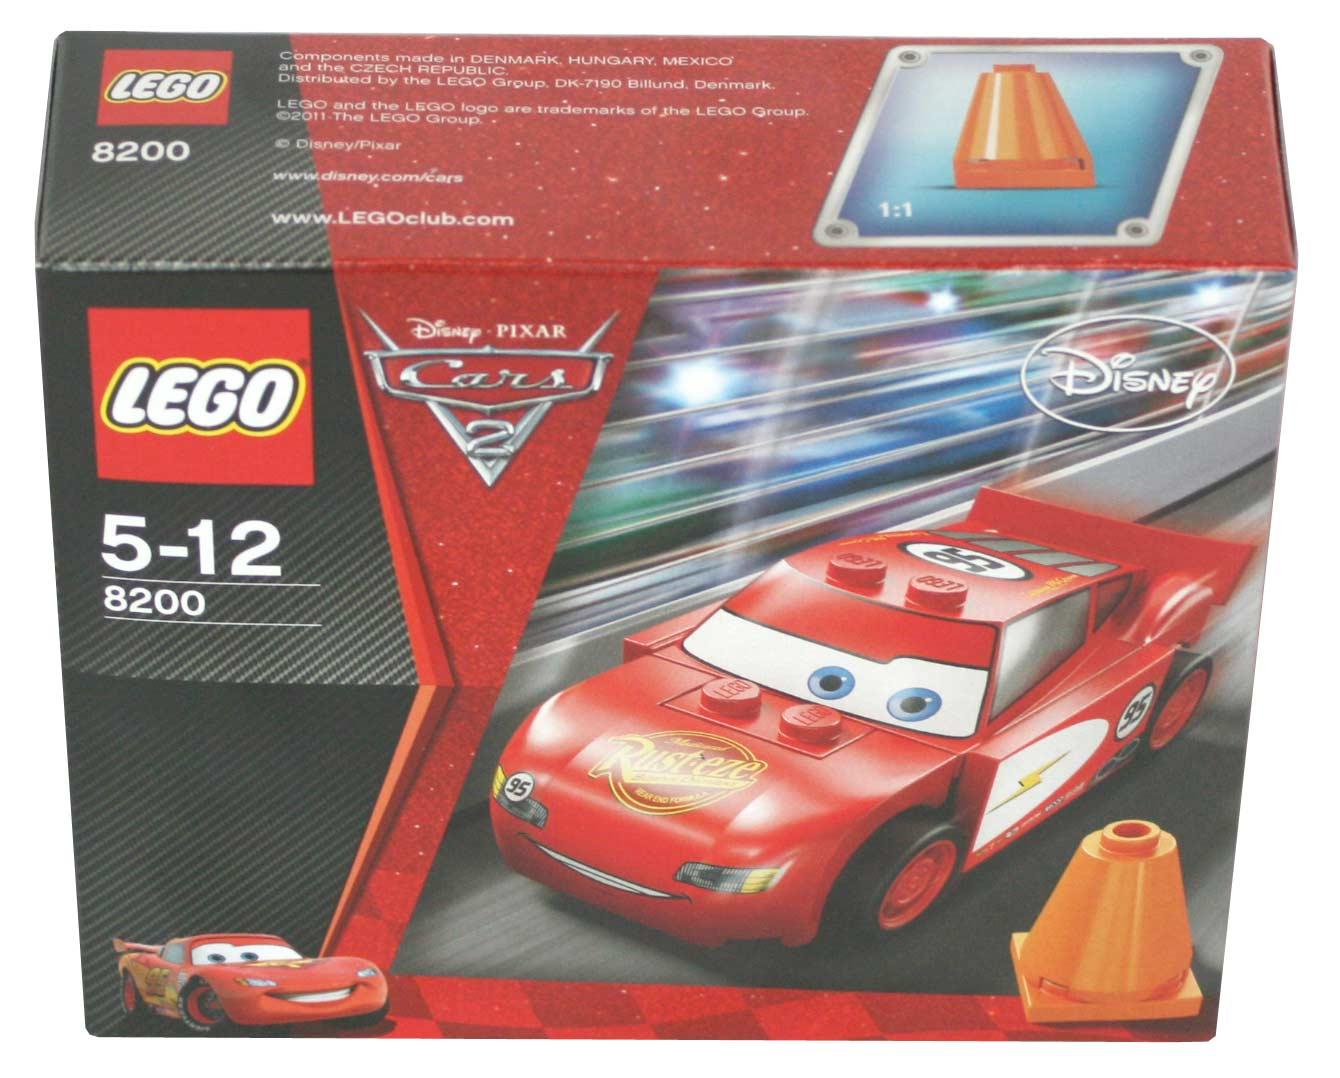 lego 8200 flash mcqueen cars 2 packaging du lego 8200 flash mcqueen cars 2 otakia. Black Bedroom Furniture Sets. Home Design Ideas